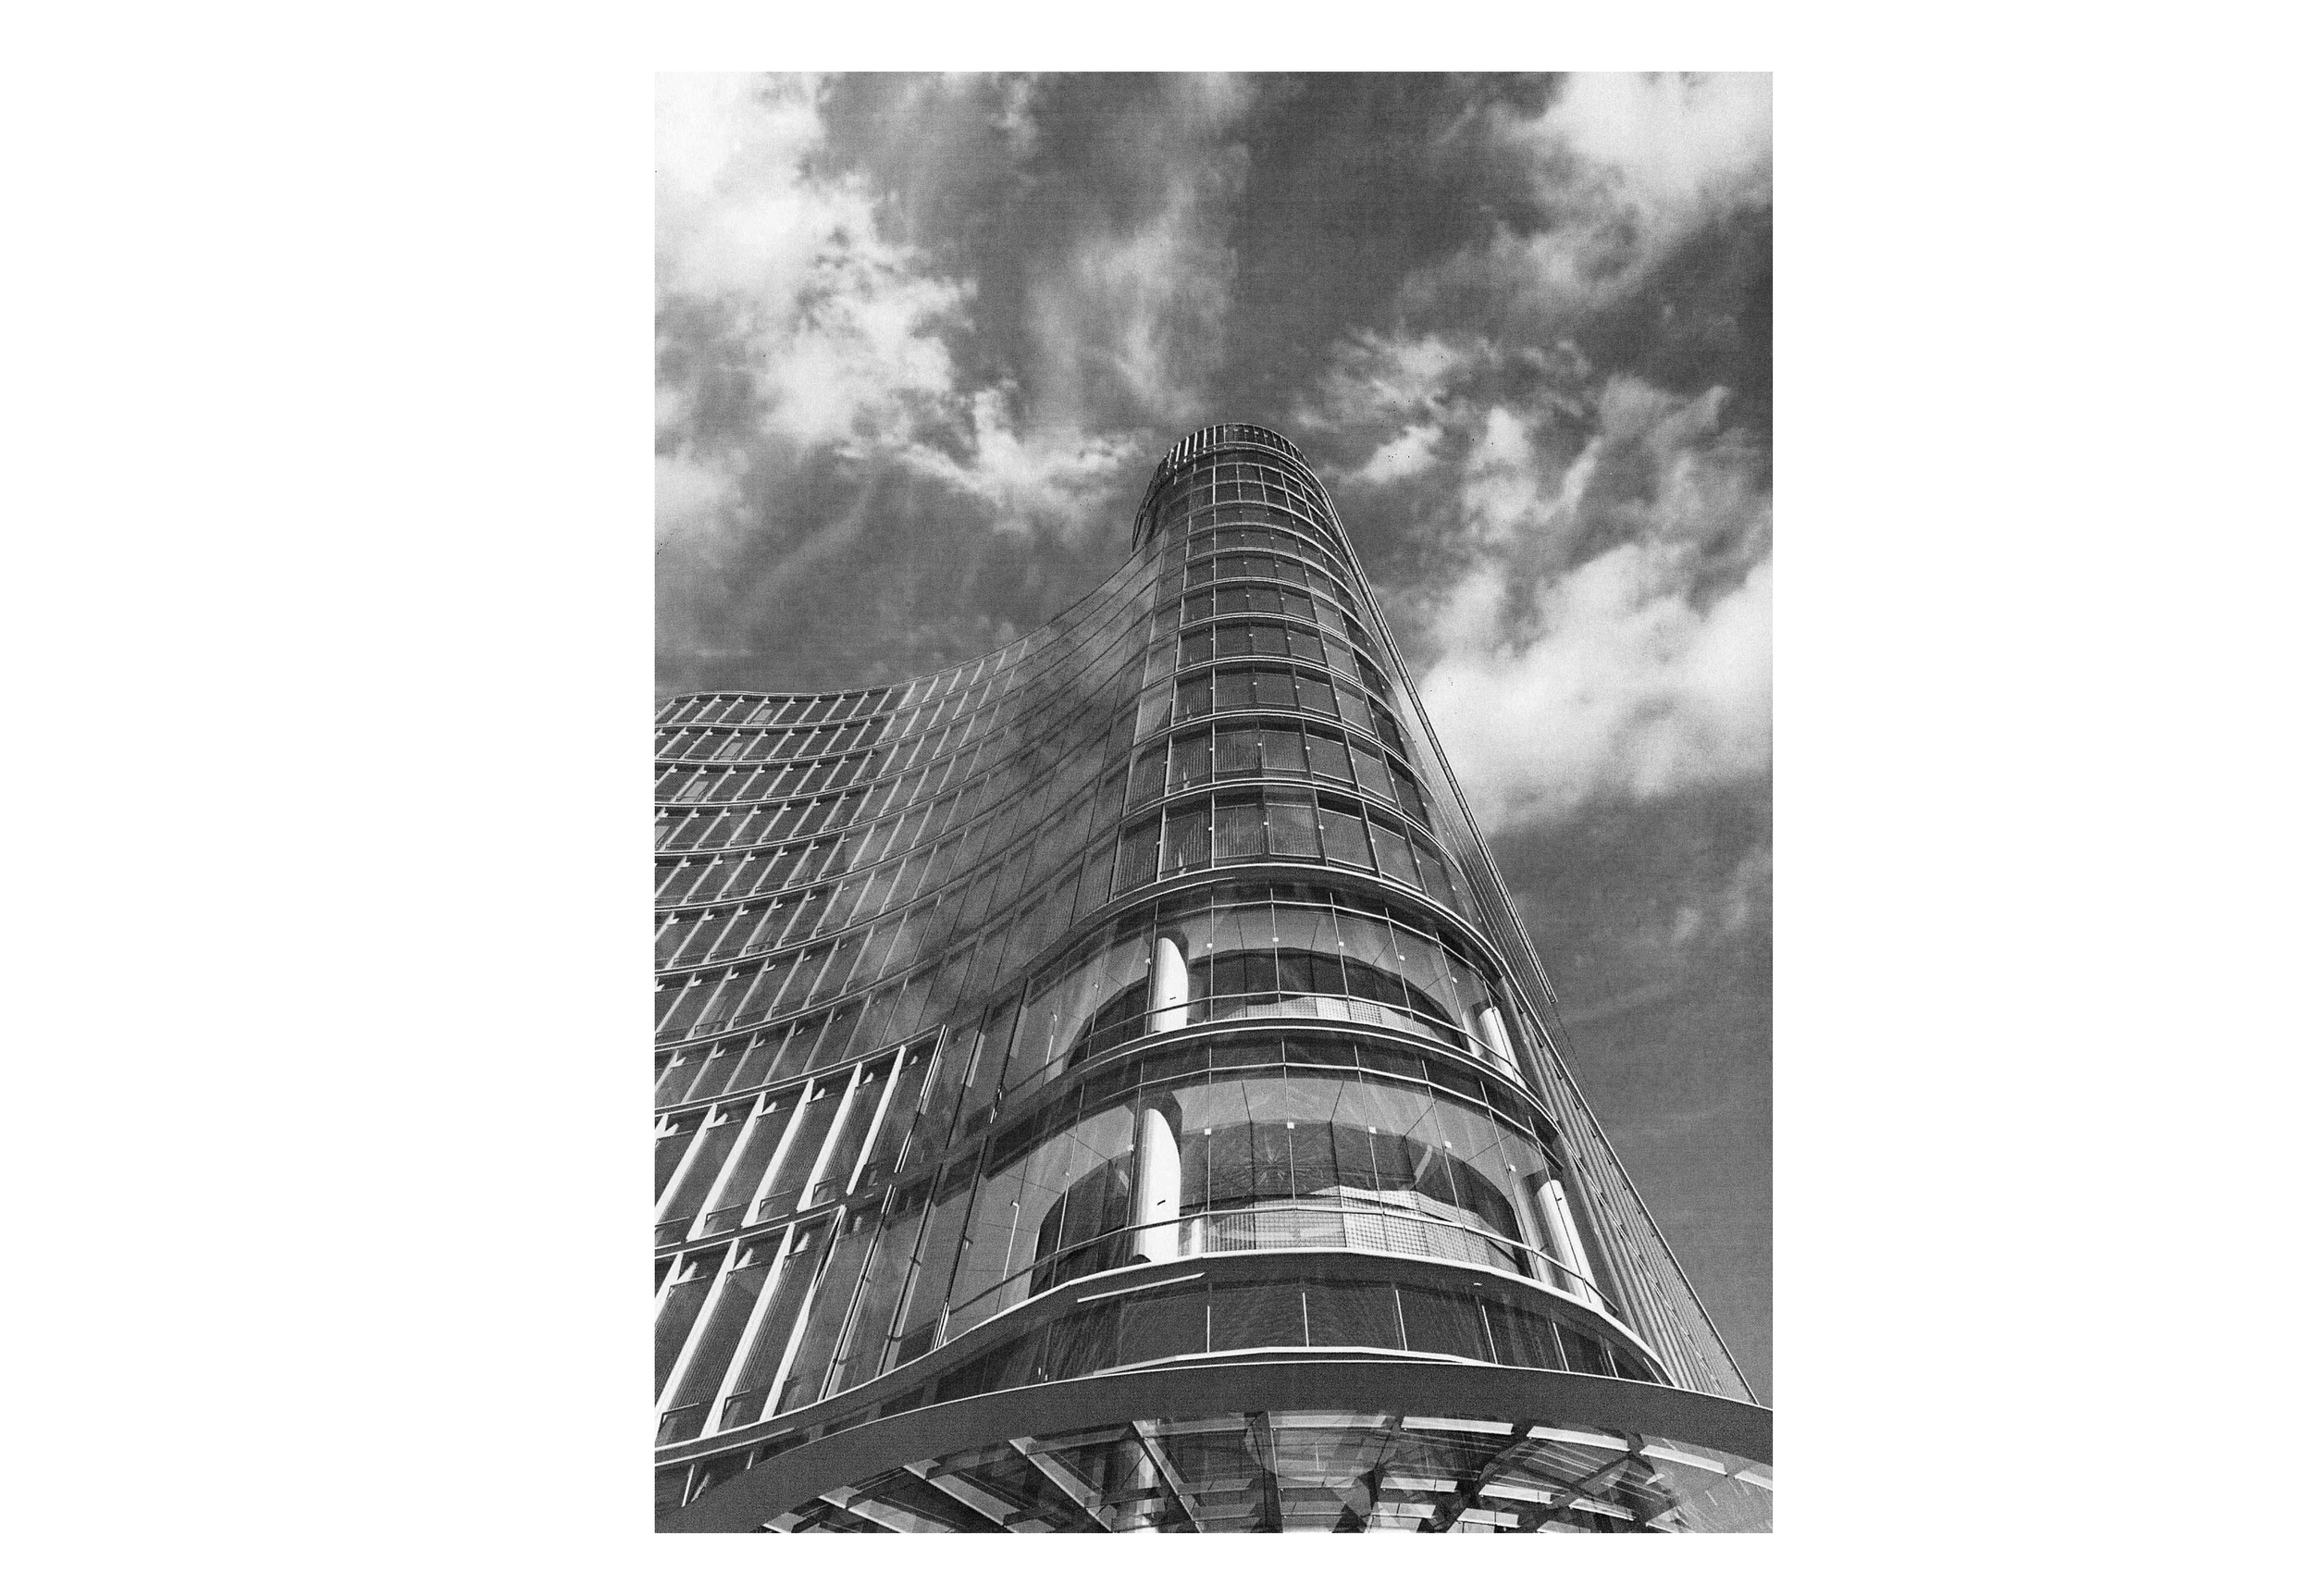 10     DESIGN: TODD HALAMKA     ARCHITECT: SOM